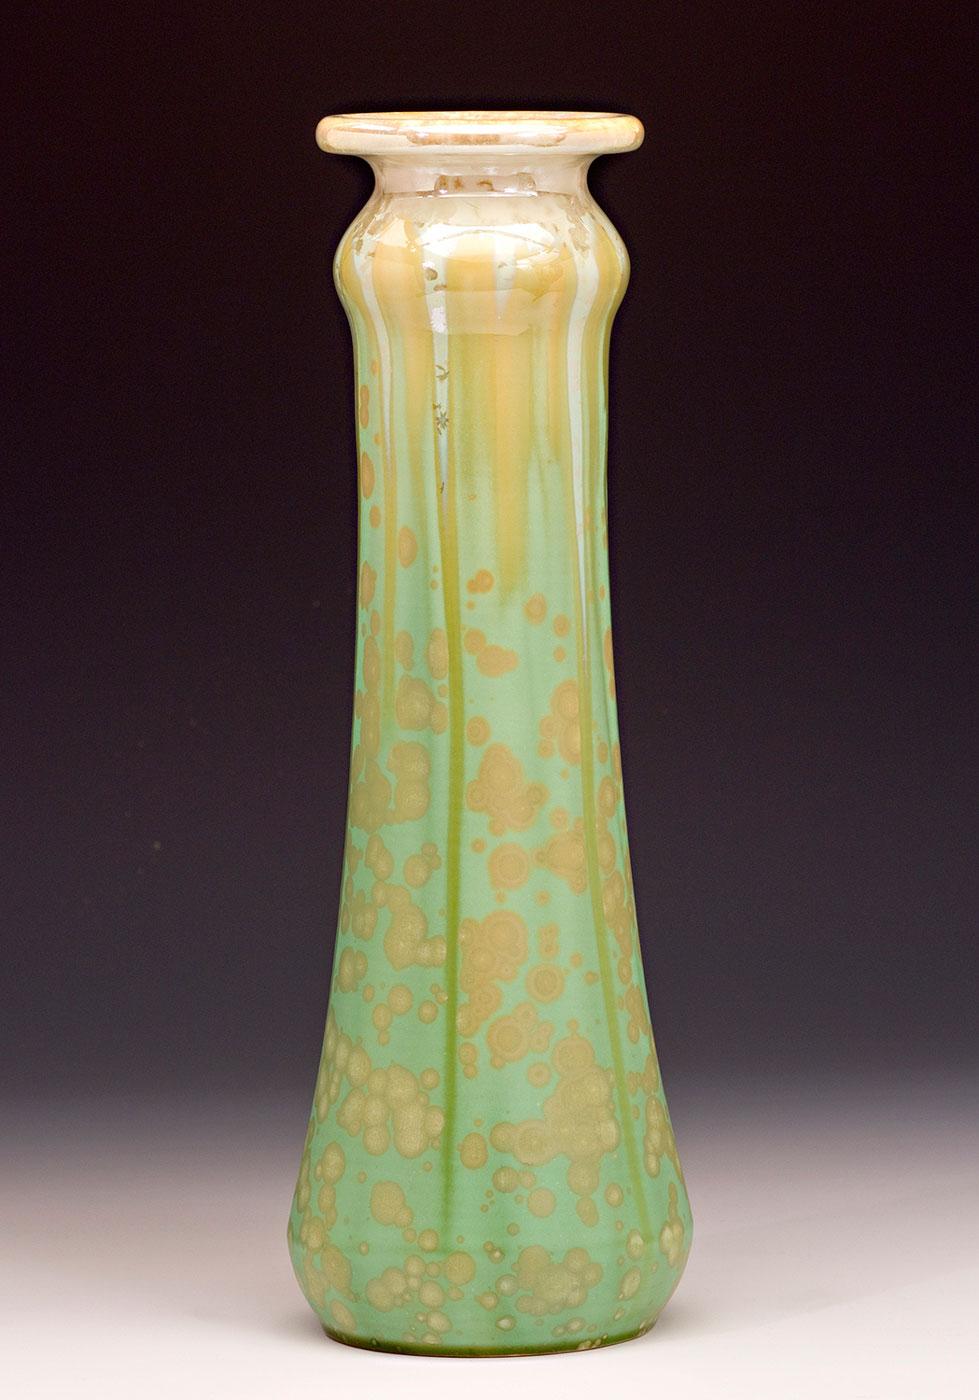 Art-Pottery-Vase-Pearl-Spring-green-crystalline-Samantha-Henneke--North-Carolina.jpg